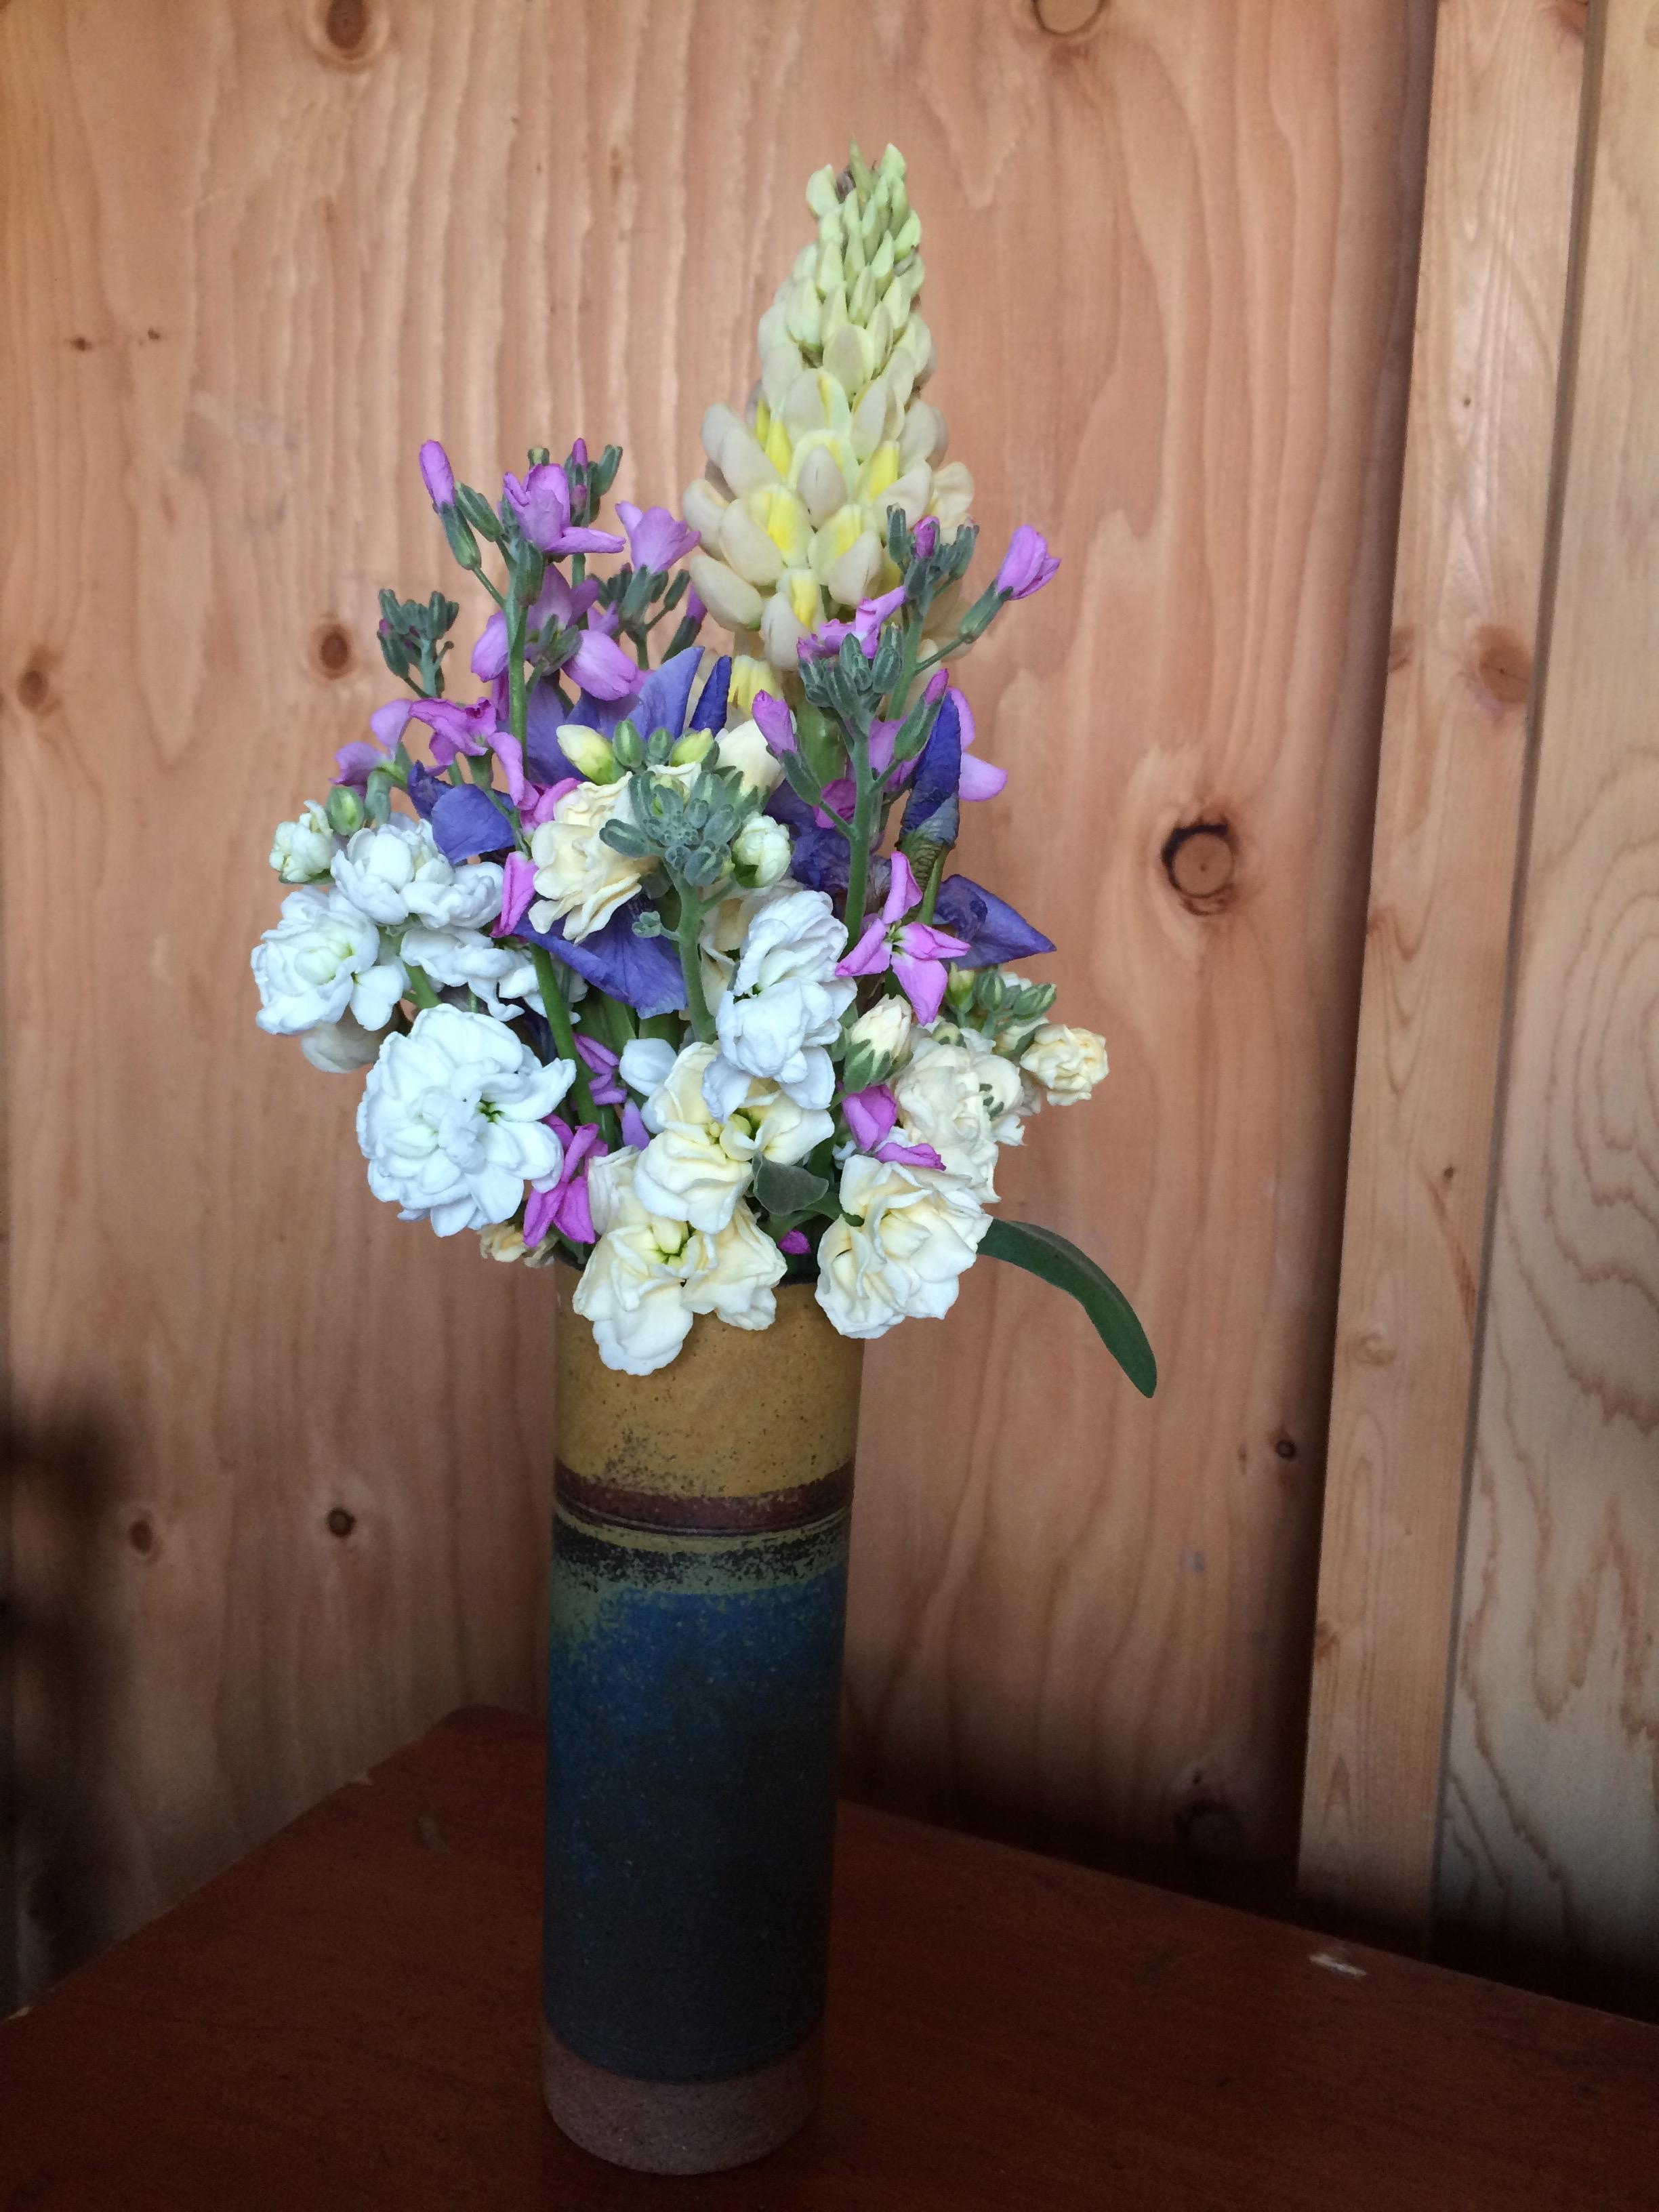 Kokoro bouquet